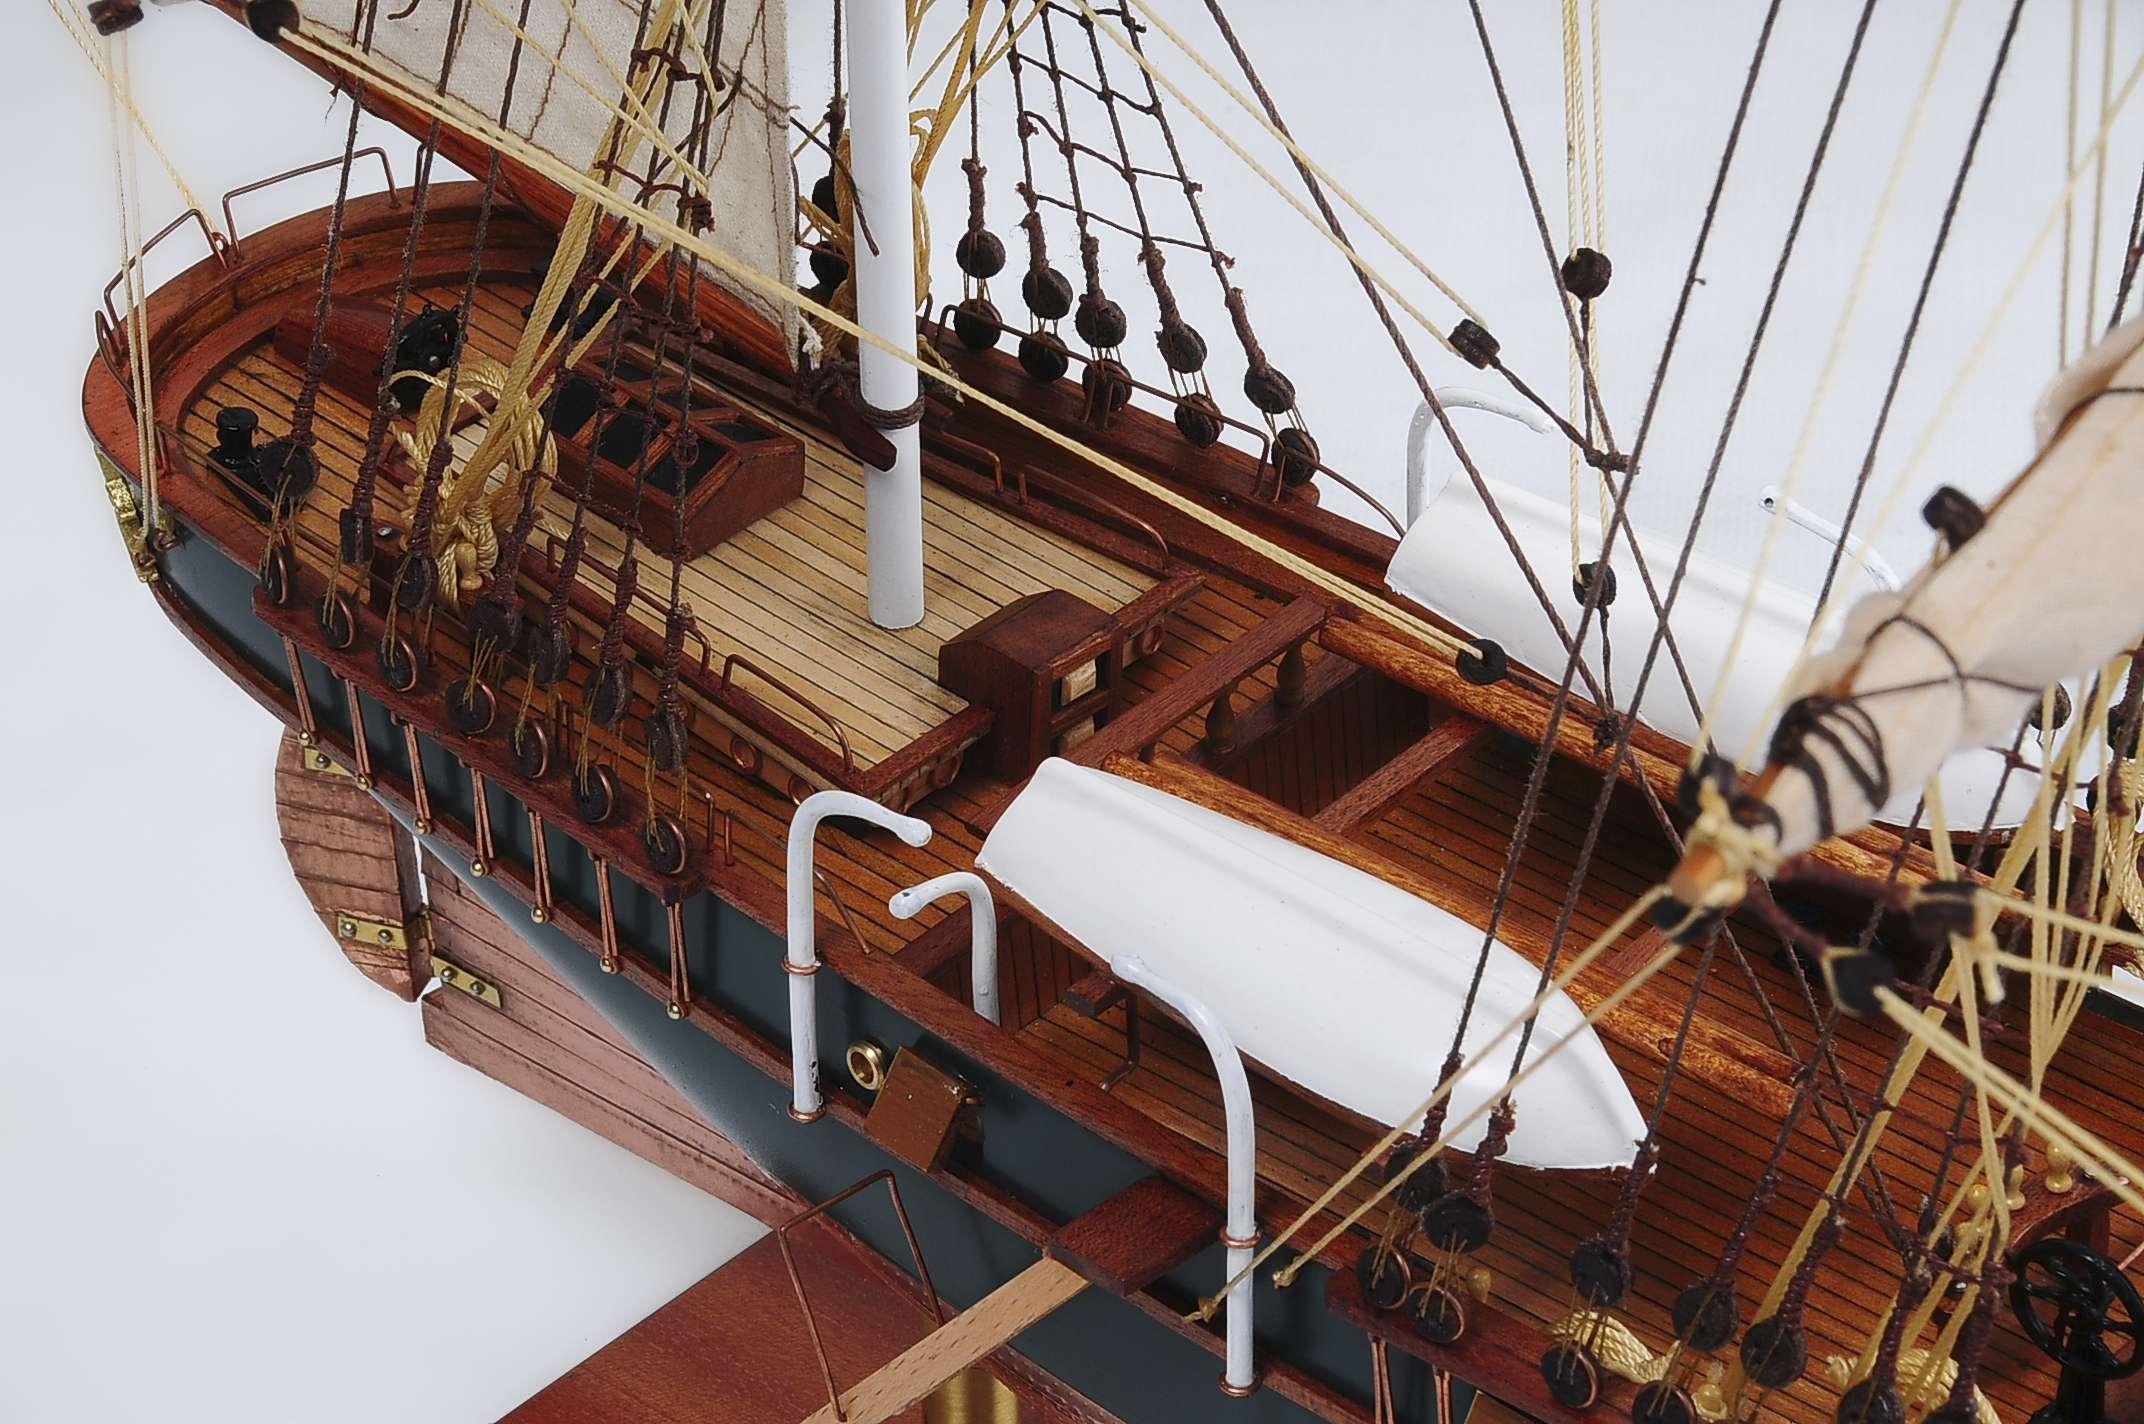 1434-4871-Thermopylae-Model-Boat